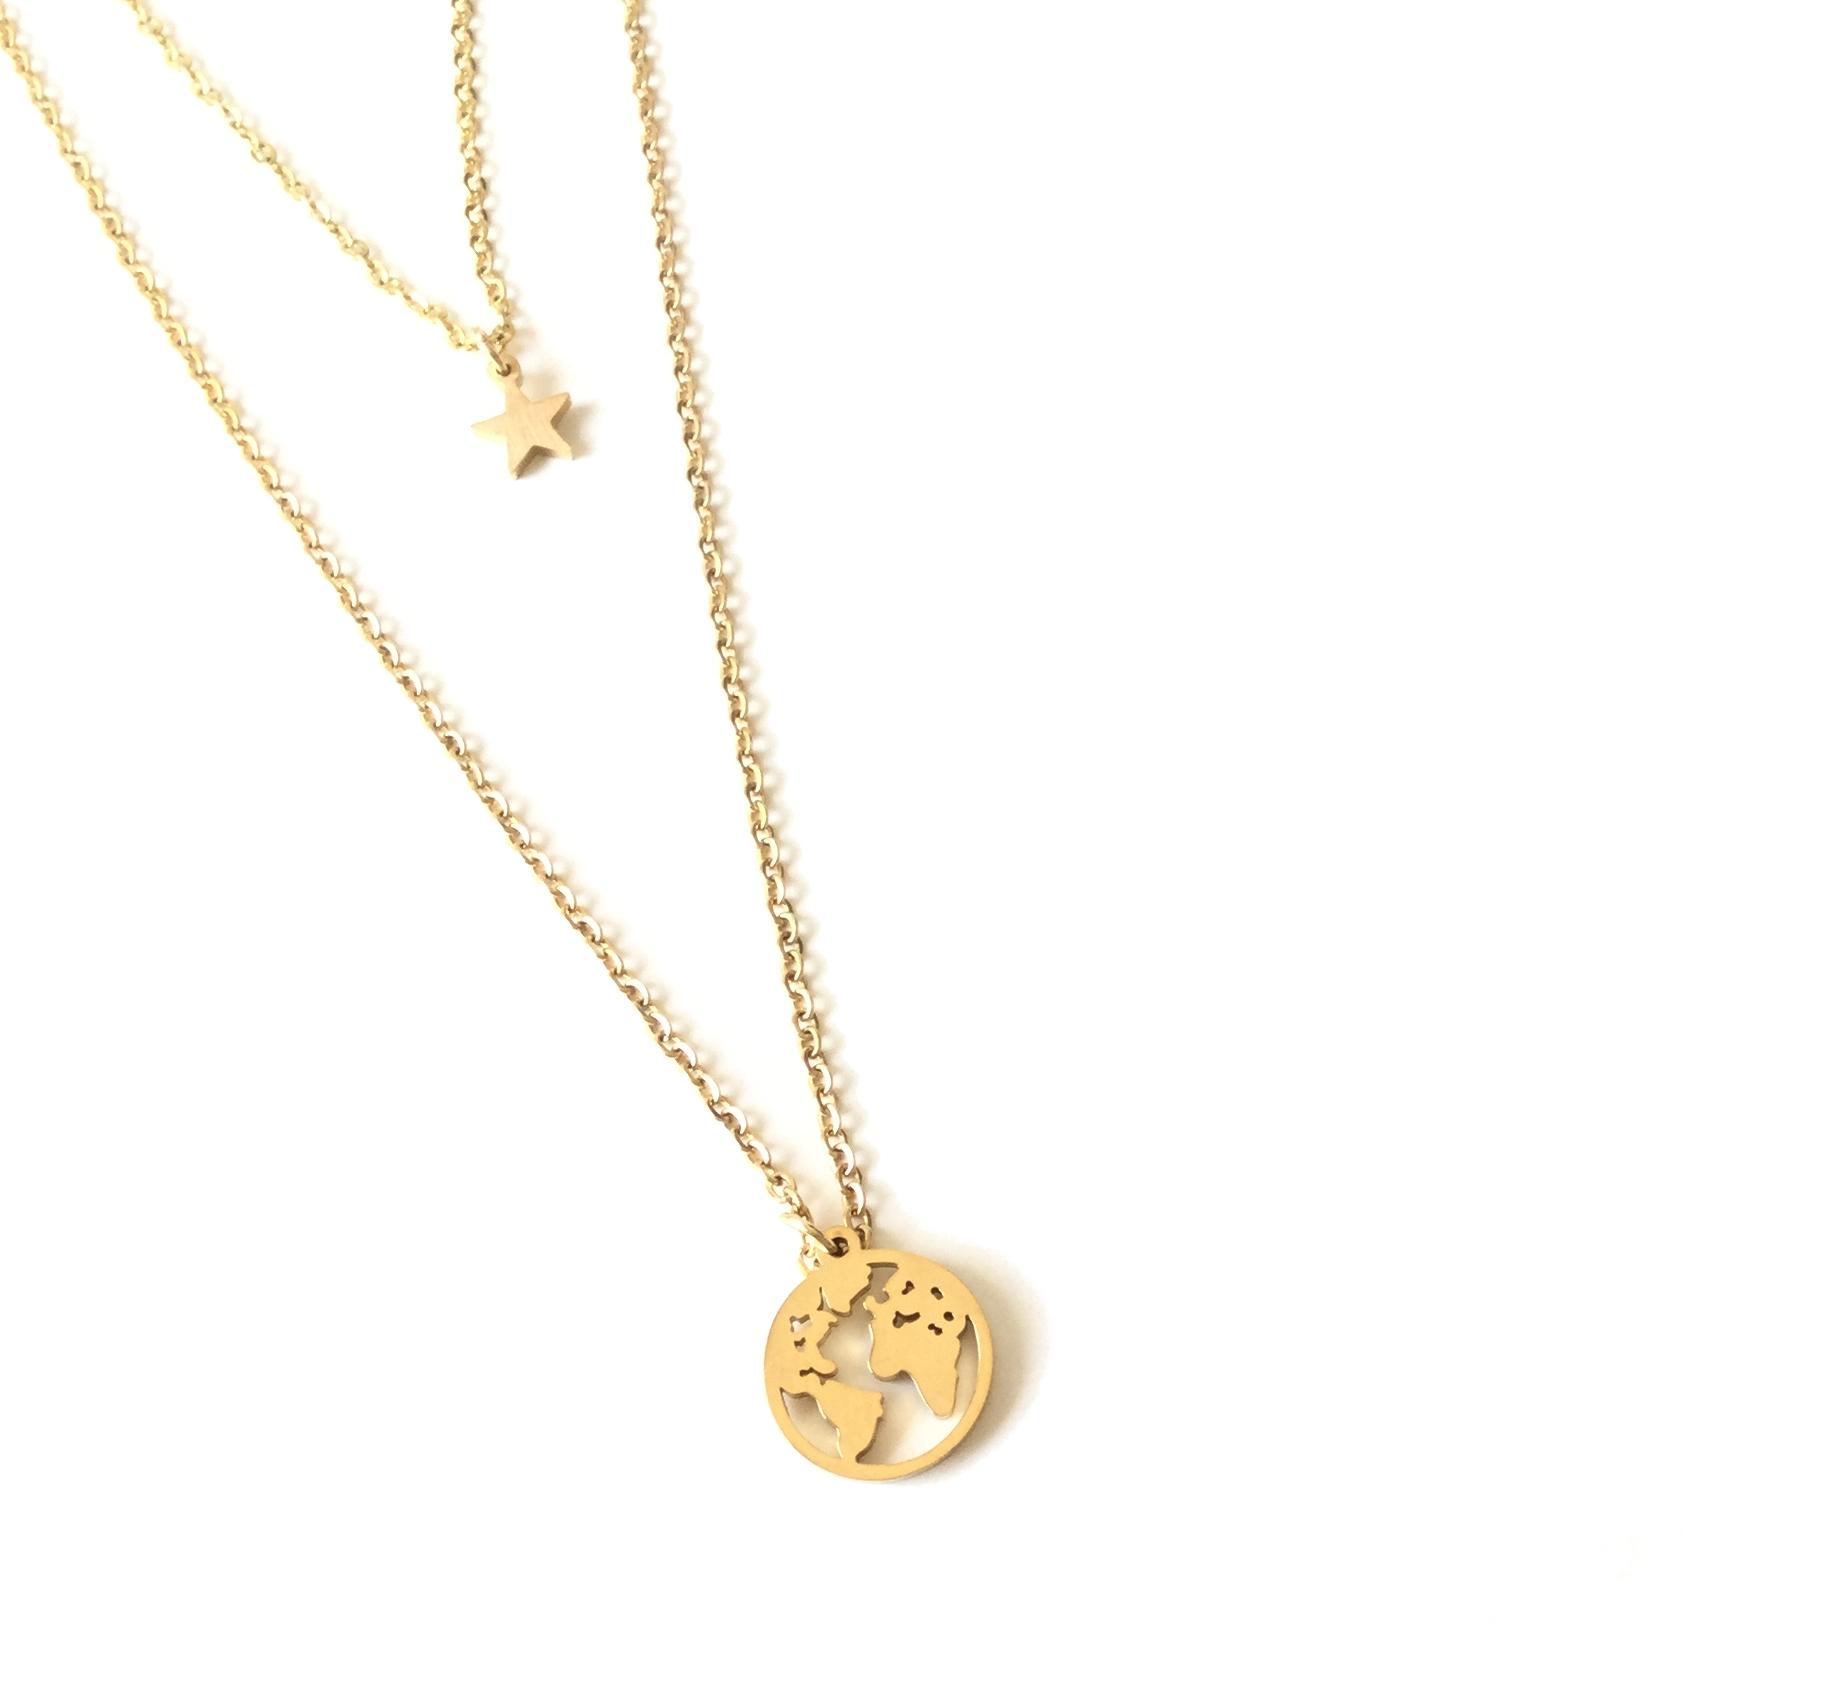 e00e40ccd5c5 COLLAR BABEL DORADO Collar de acero con doble cadena y doble colgante  consistentes en una pequeña